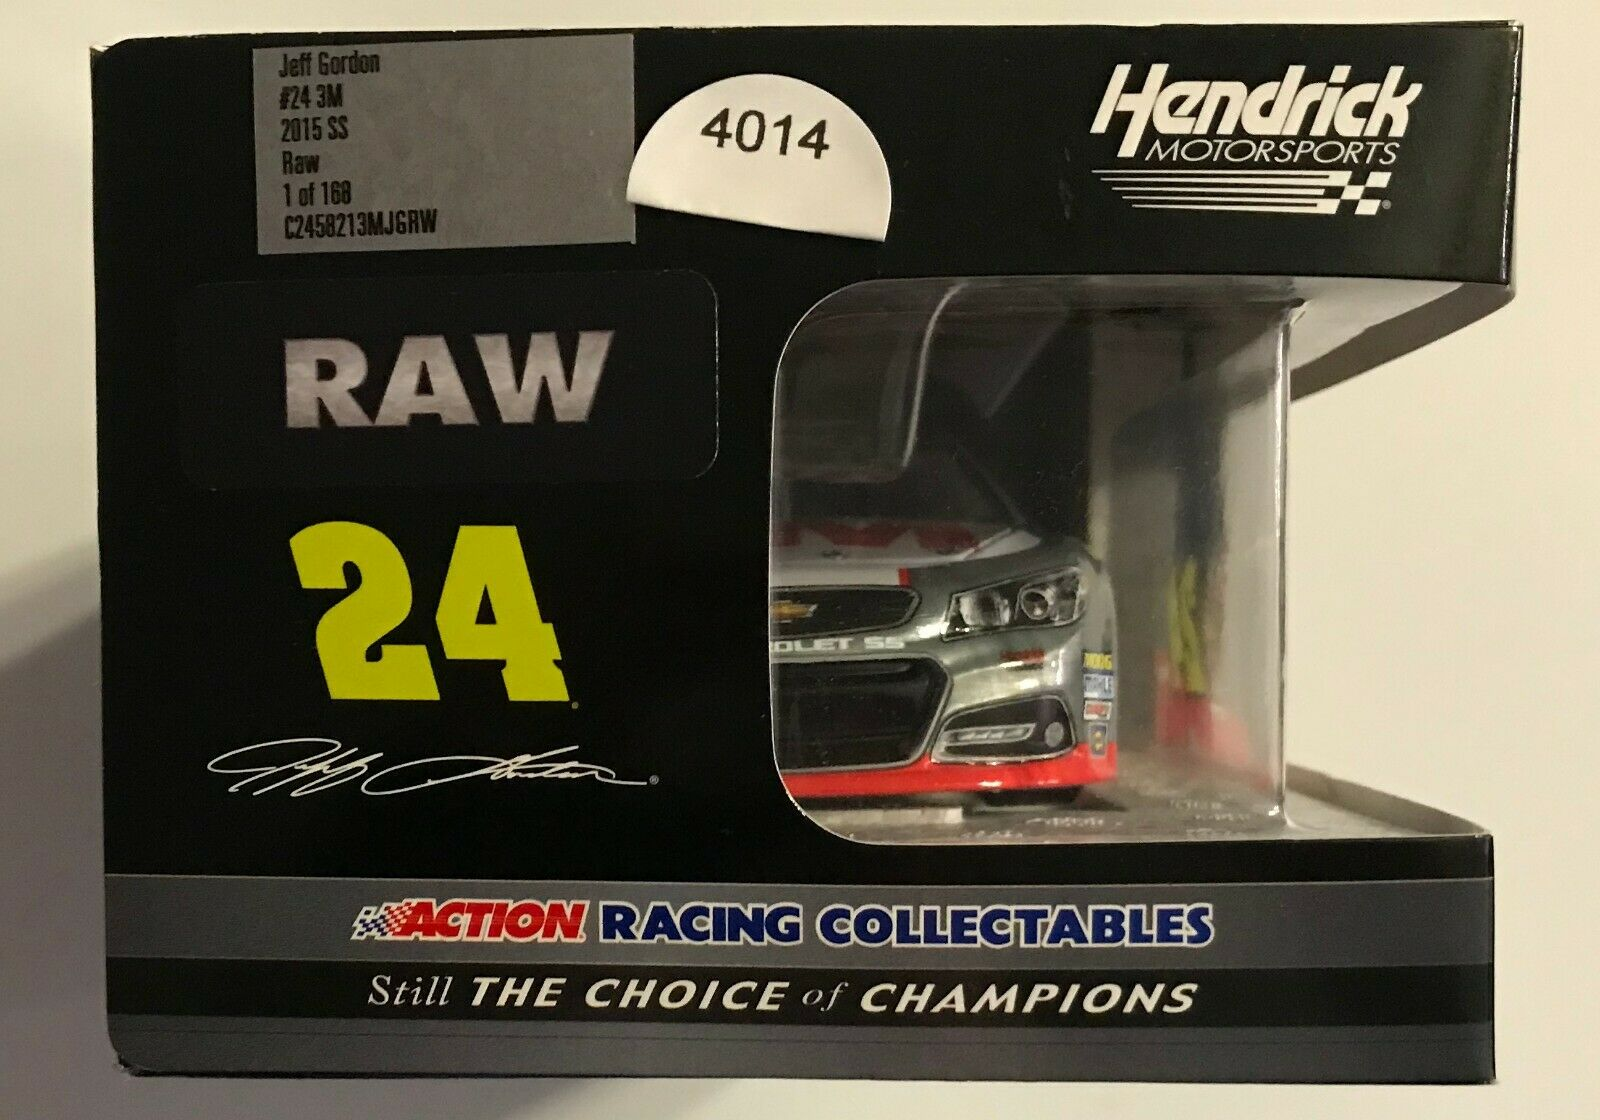 2015   24 JEFF GORDON  - 3M  - RAW - 1 24th SCALE    4014